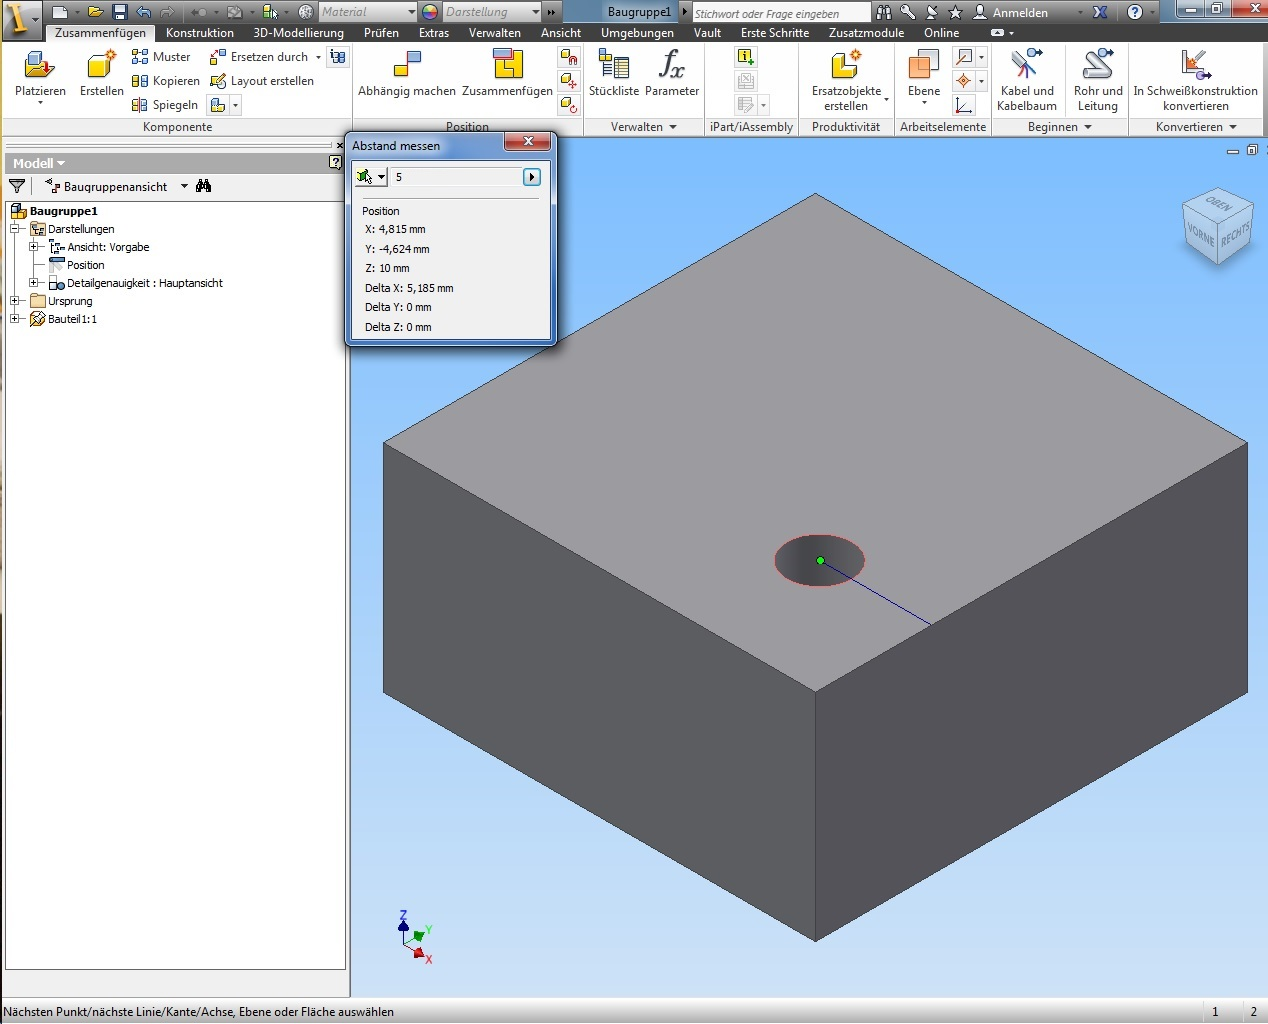 Tolle Kabelbaum Design Software Ideen - Der Schaltplan - greigo.com